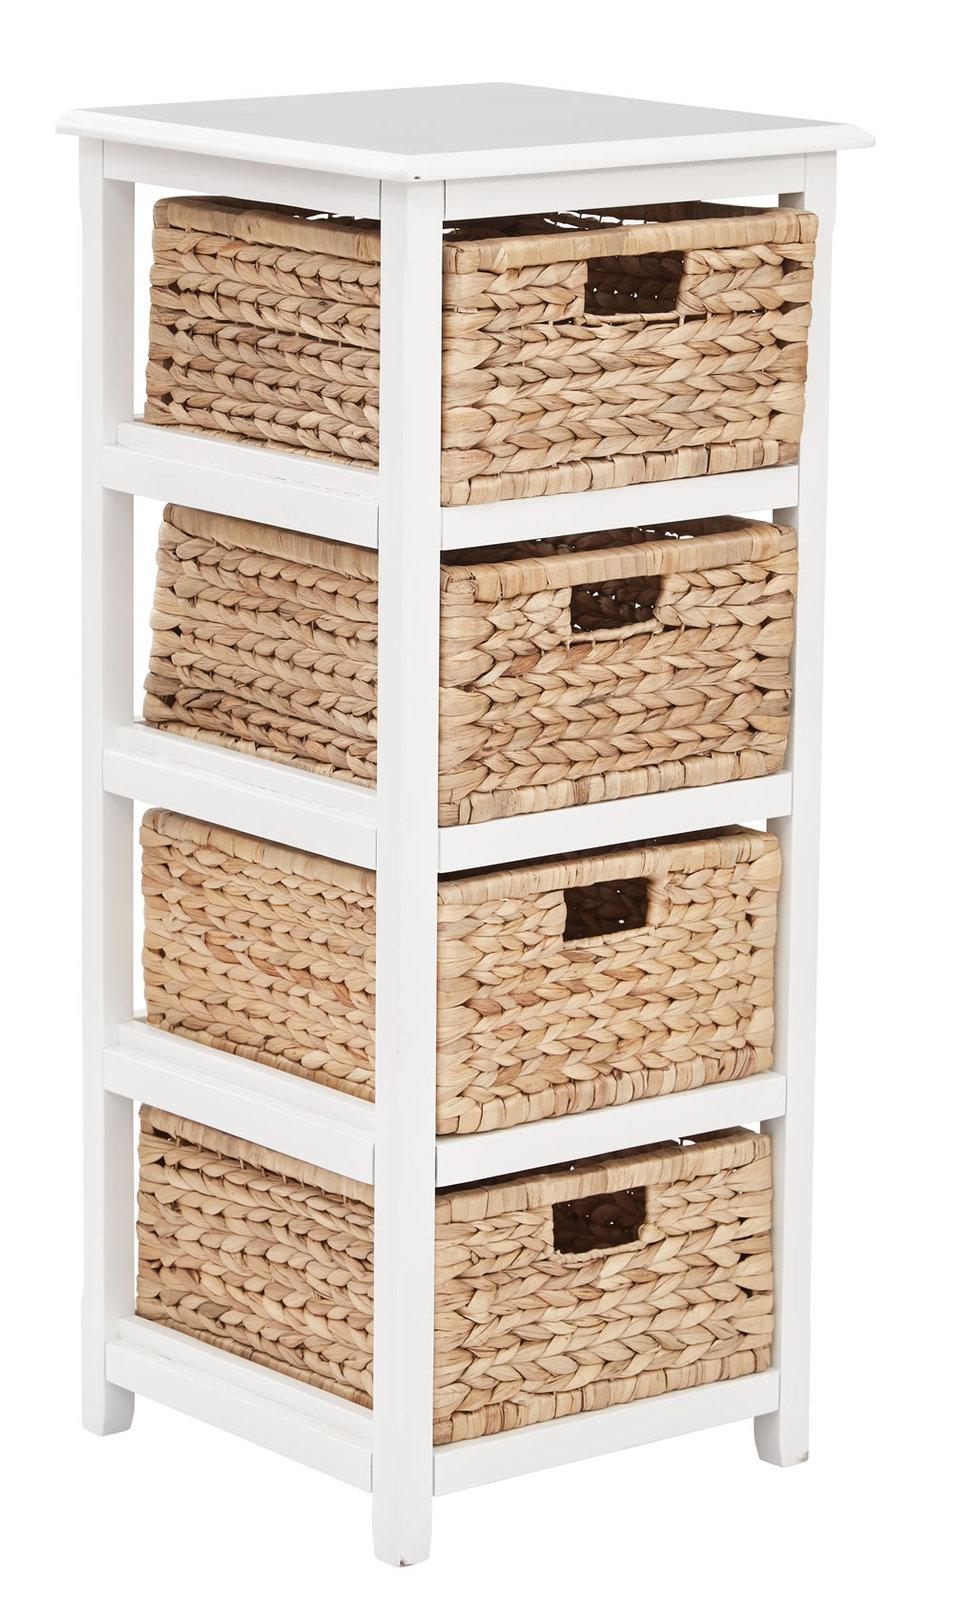 4 Drawer Espresso Or White Wood Storage Tower W/Baskets